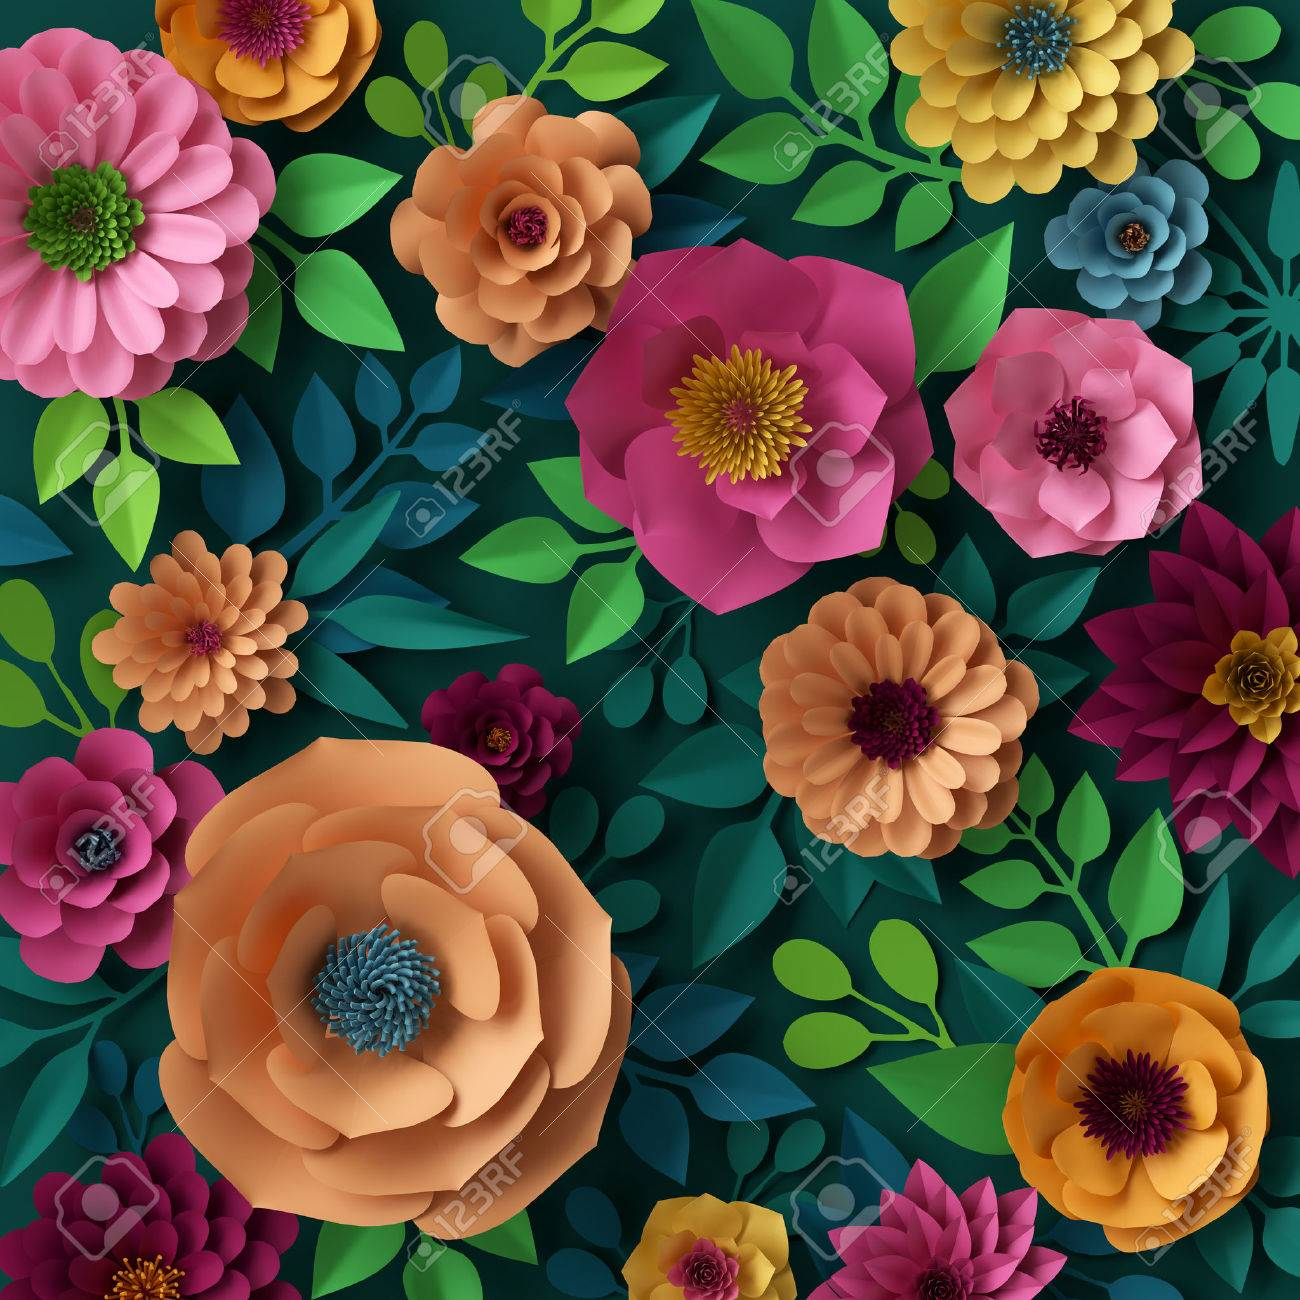 3d render digital illustration colorful paper flowers wallpaper 3d render digital illustration colorful paper flowers wallpaper spring summer background stock illustration mightylinksfo